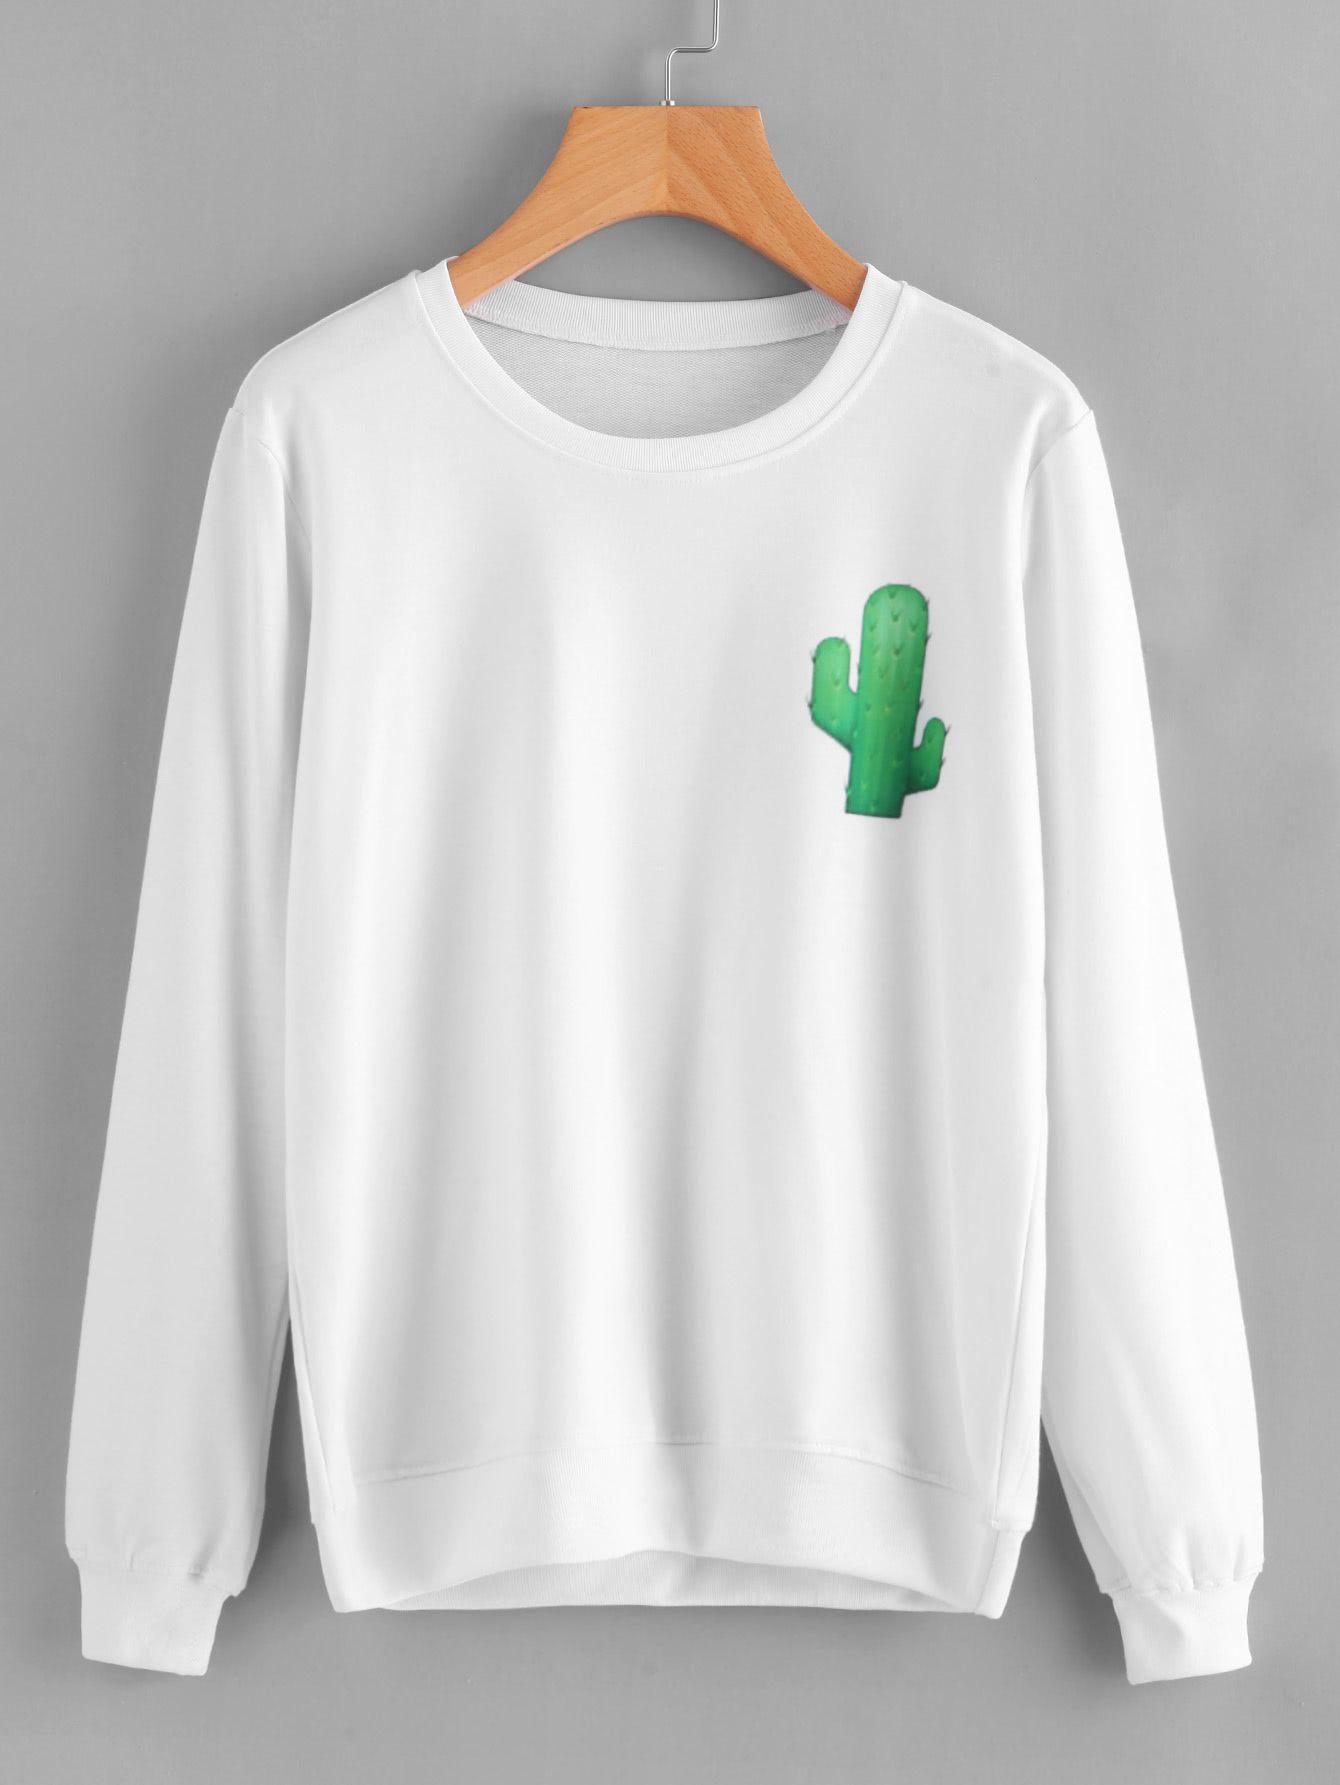 7faee6c3af Shop Cactus Print Sweatshirt online. SheIn offers Cactus Print Sweatshirt    more to fit your fashionable needs.